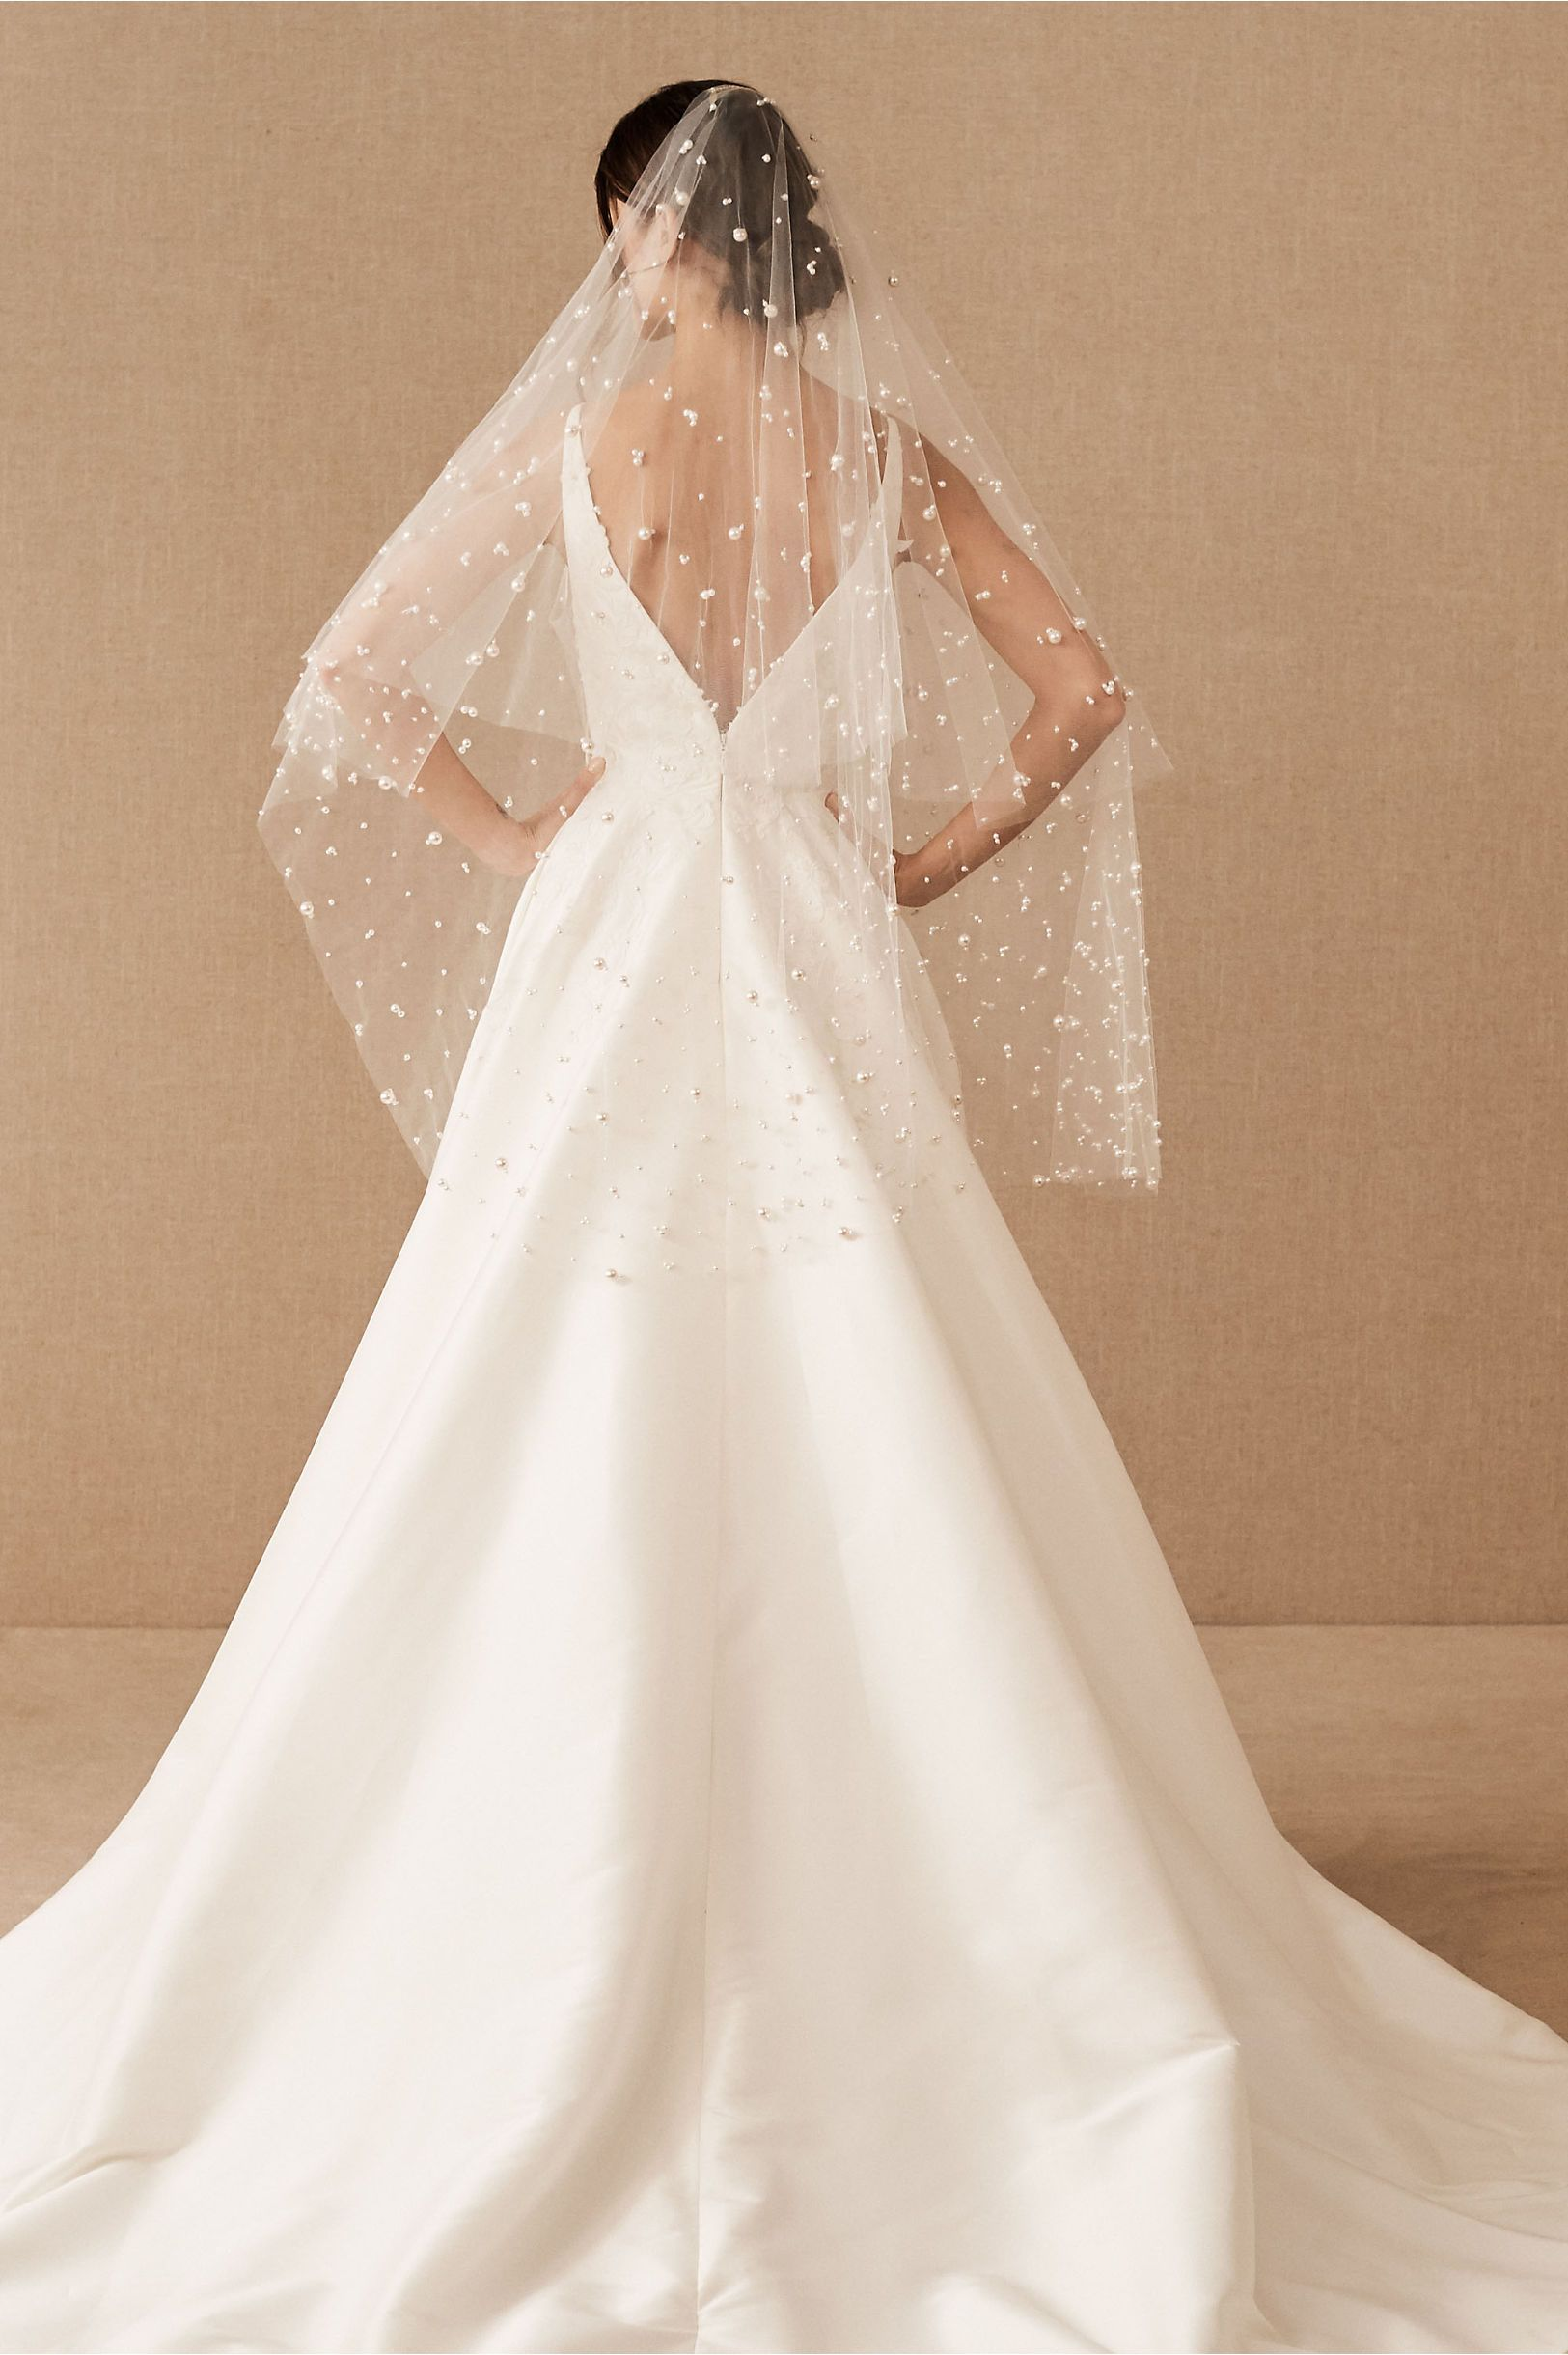 Twigs Honey Dolce Fingertip Veil From Bhldn Ball Gowns Wedding Wedding Dresses Simple Wedding Dresses [ 2440 x 1625 Pixel ]